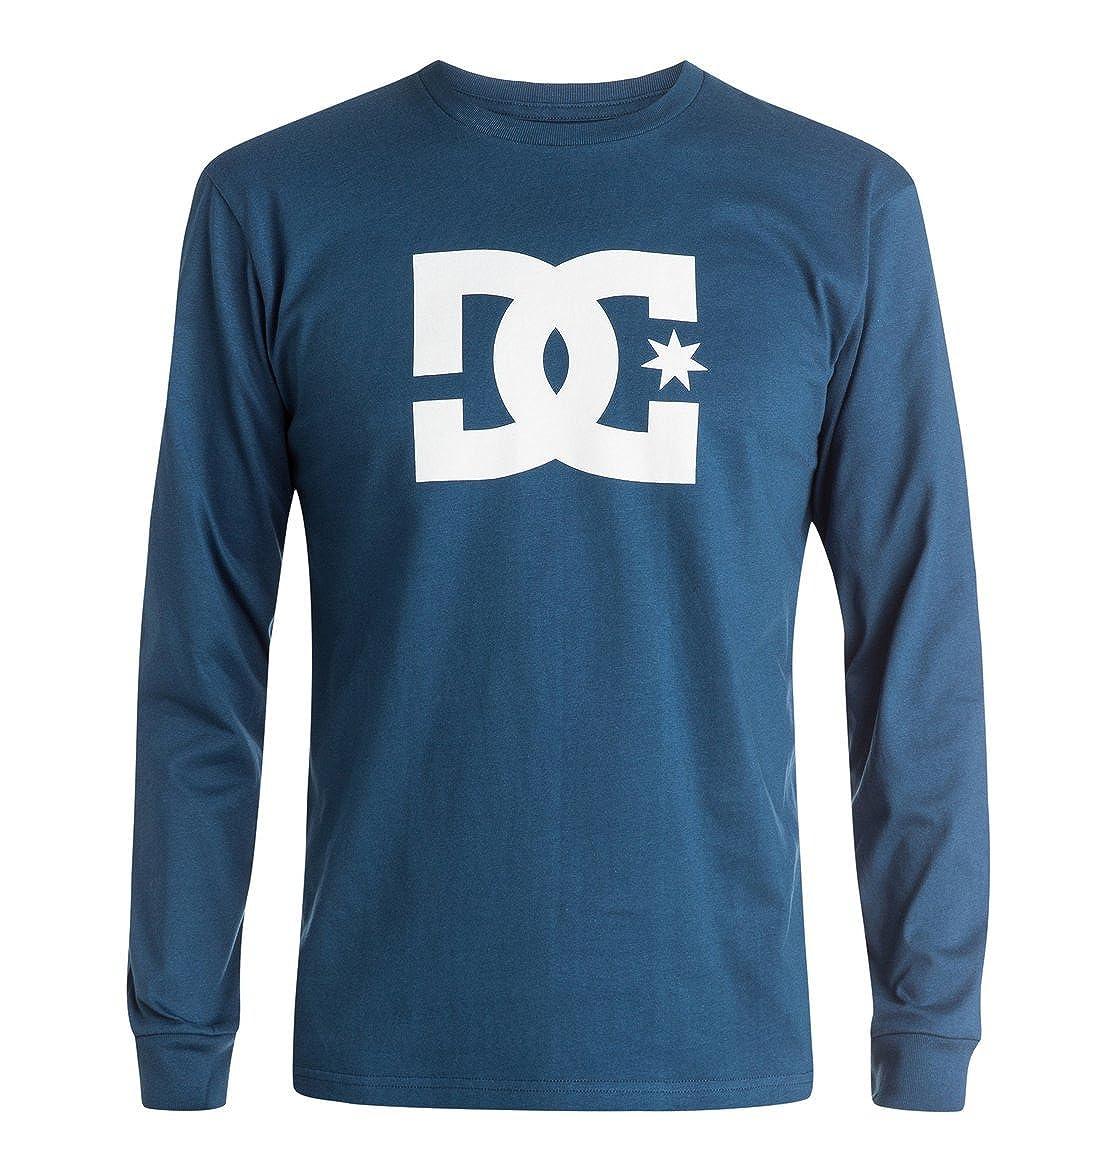 DC Men's Star Long Sleeve Logo Tee Shirt DC Young Men's